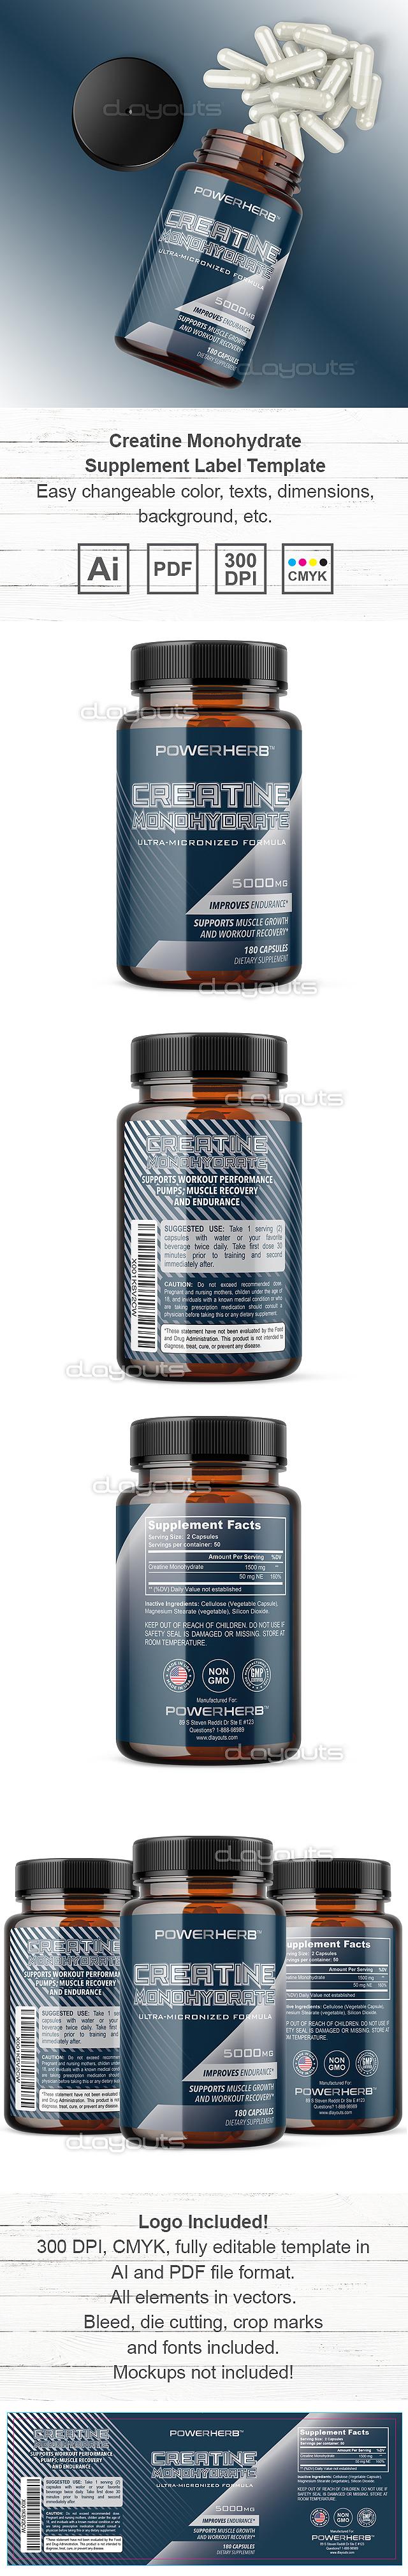 Creatine Monohydrate Supplement Label Template